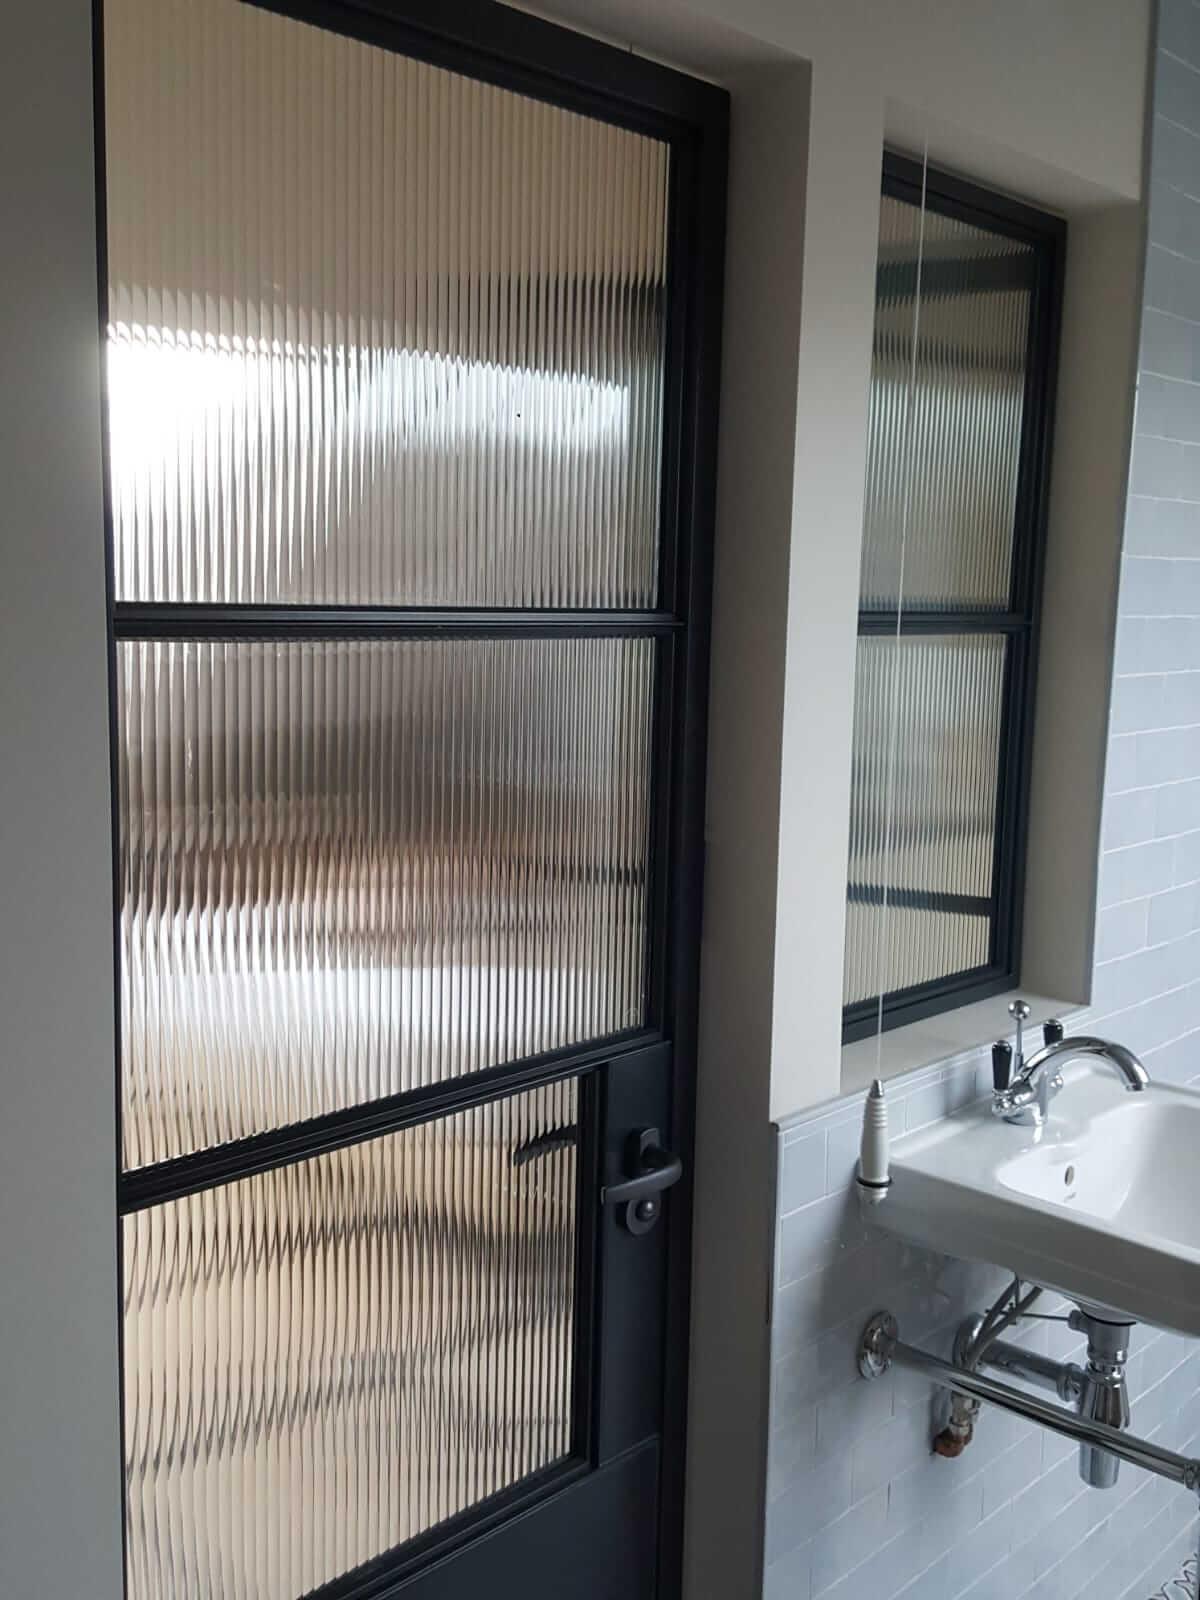 Original Steel Window and Doors with reeded glass Fulham 4